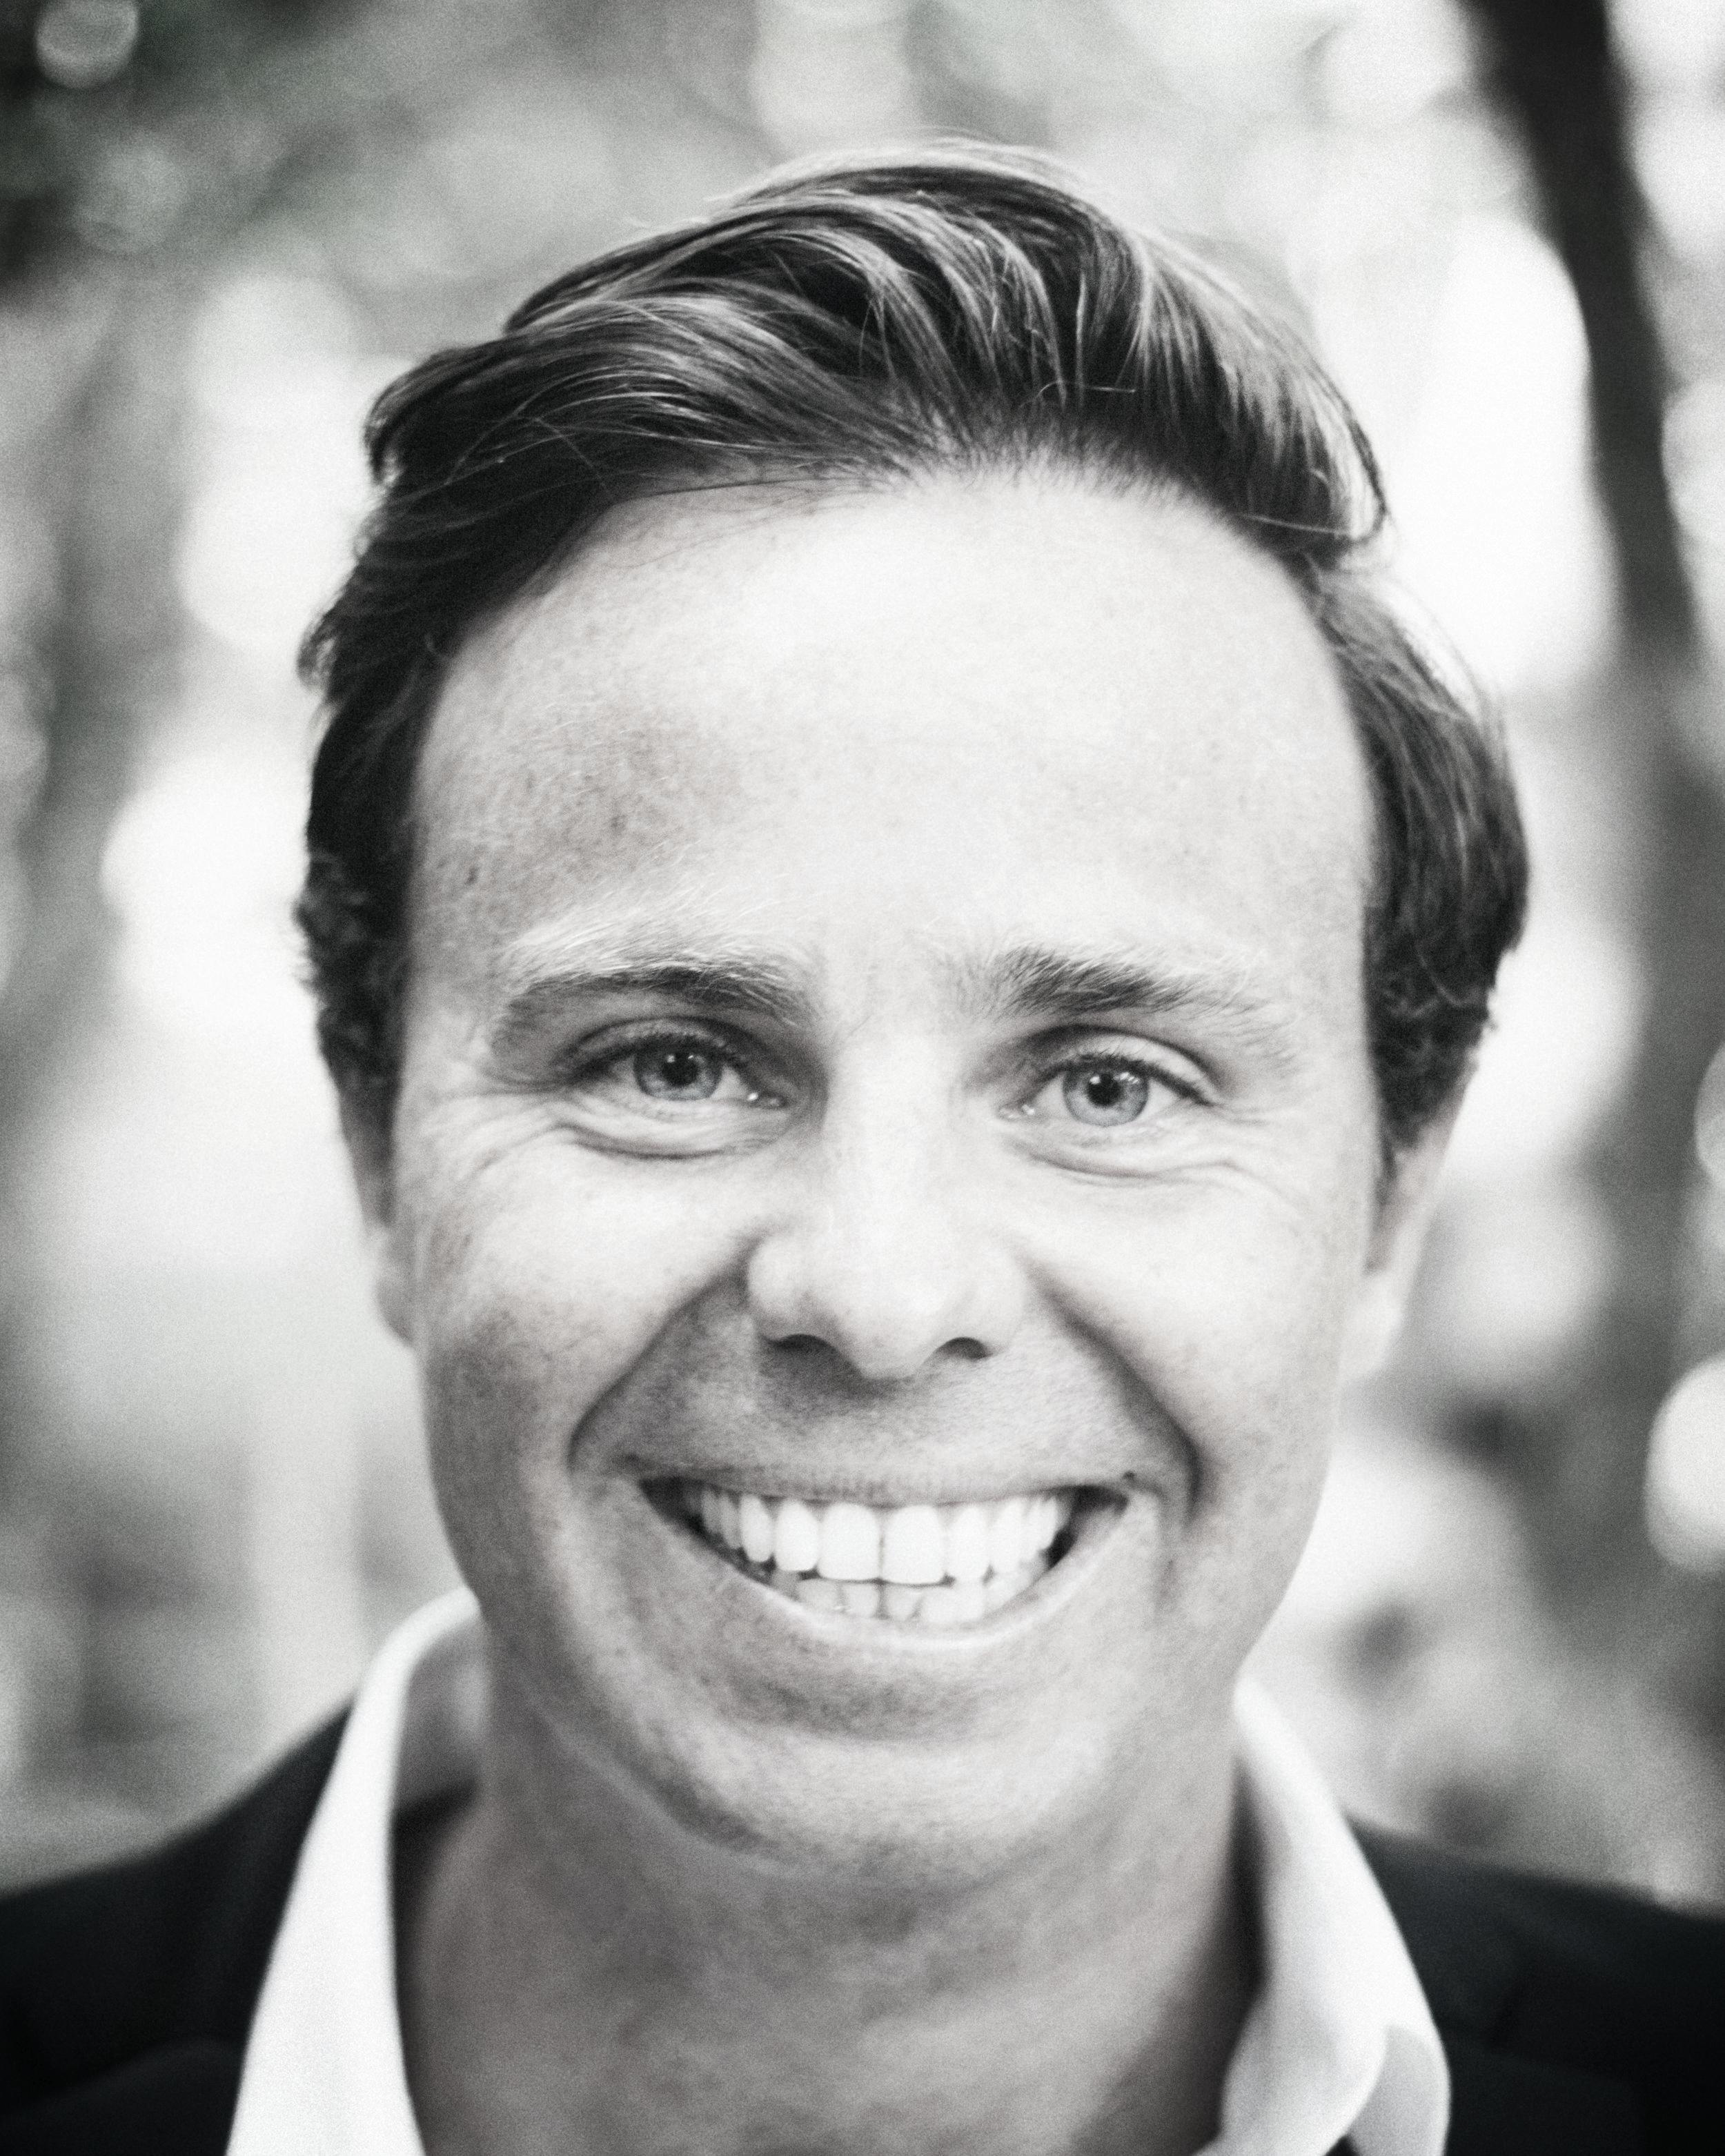 DAVID - CEO/CO-FOUNDER